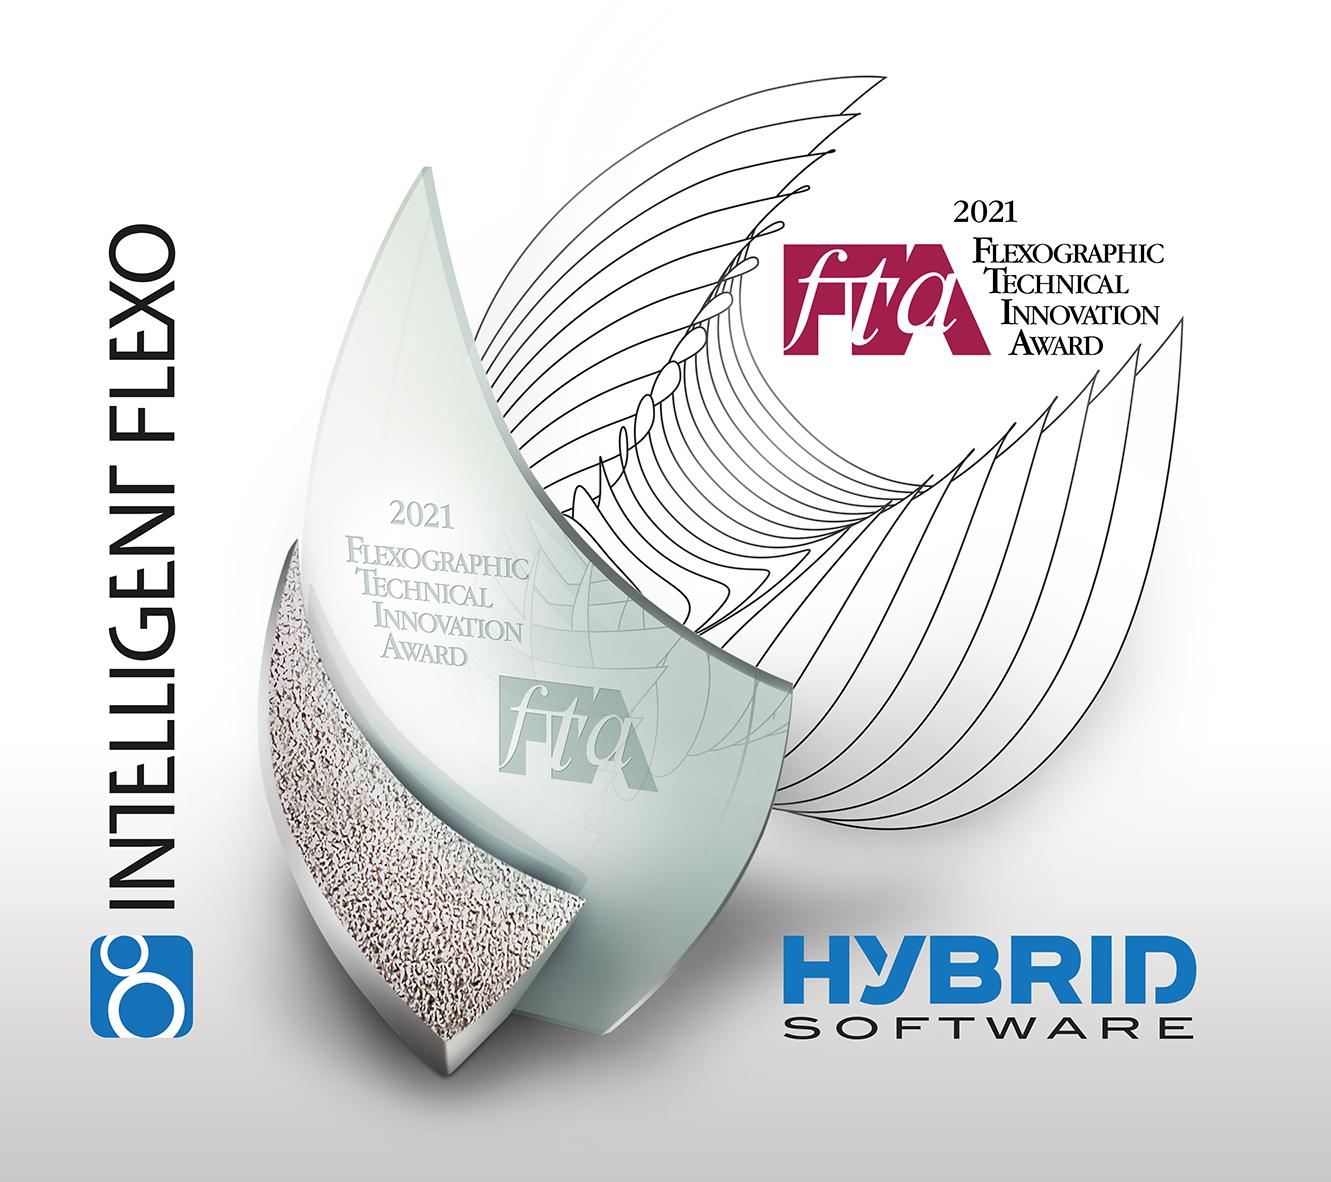 FTA Award 2021 HYBRID Software